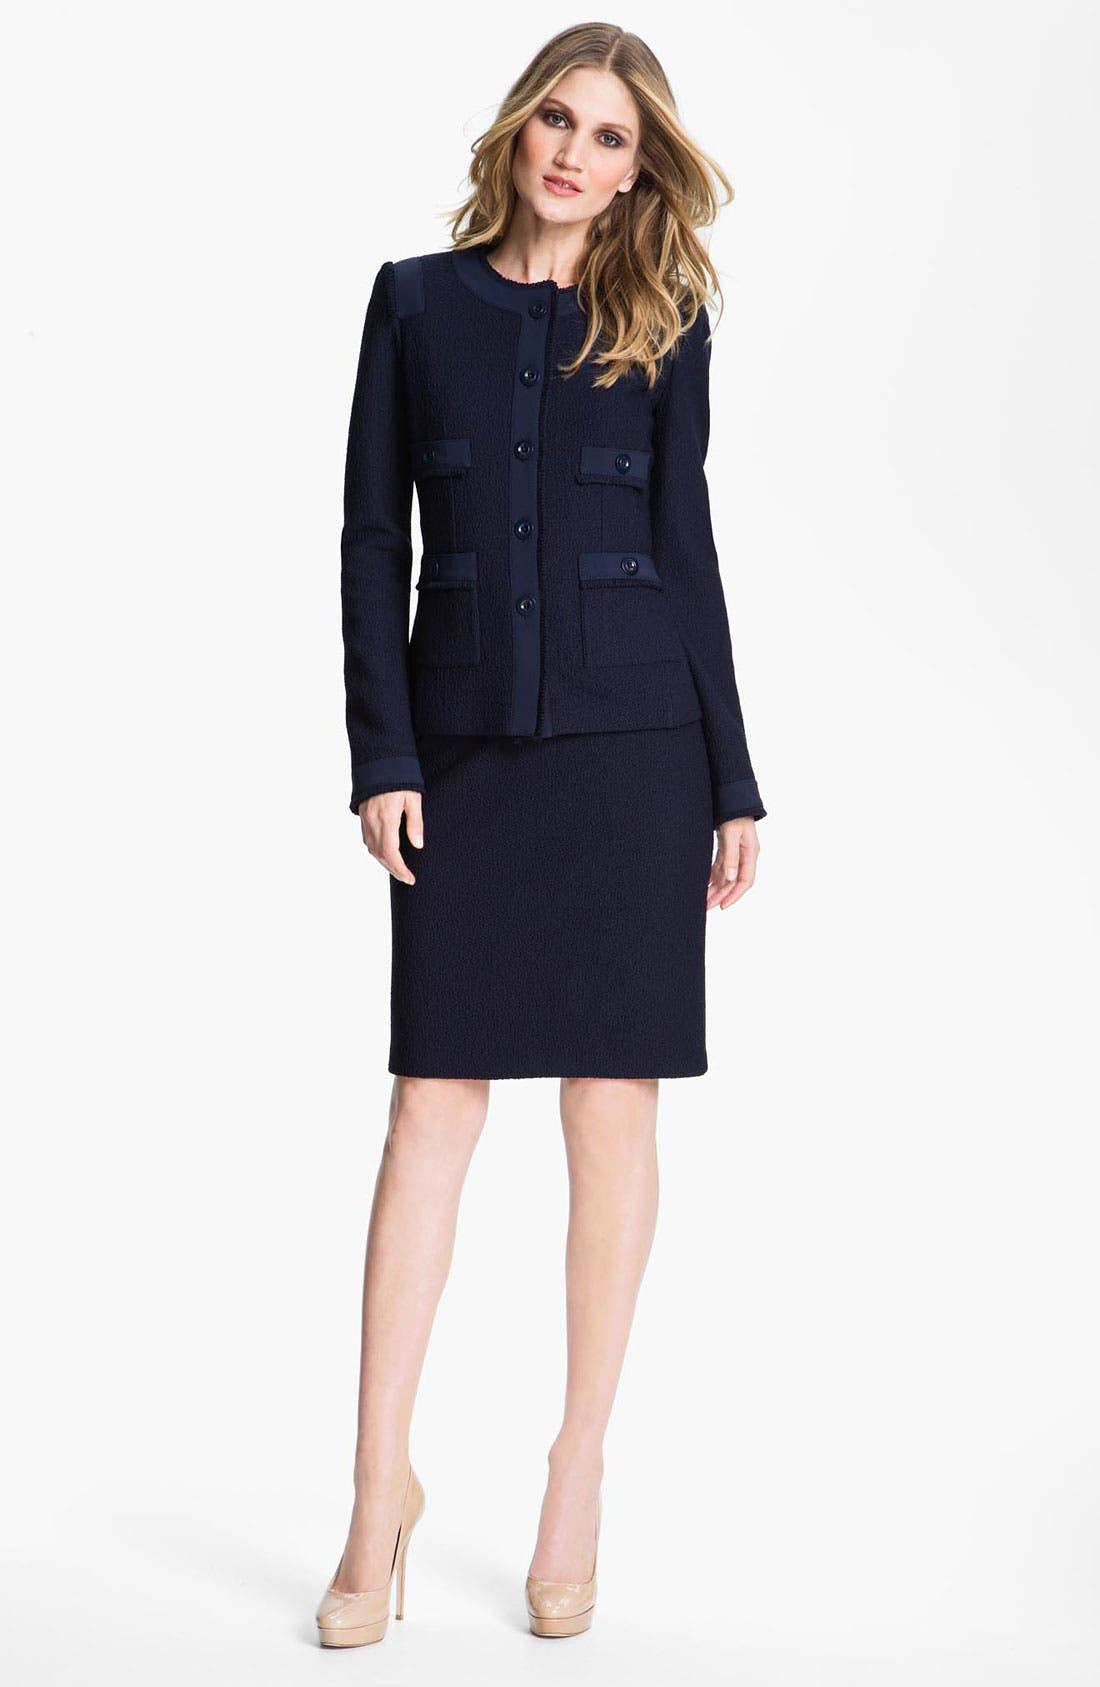 Alternate Image 1 Selected - St. John Collection Bouclé Jacket & Dress